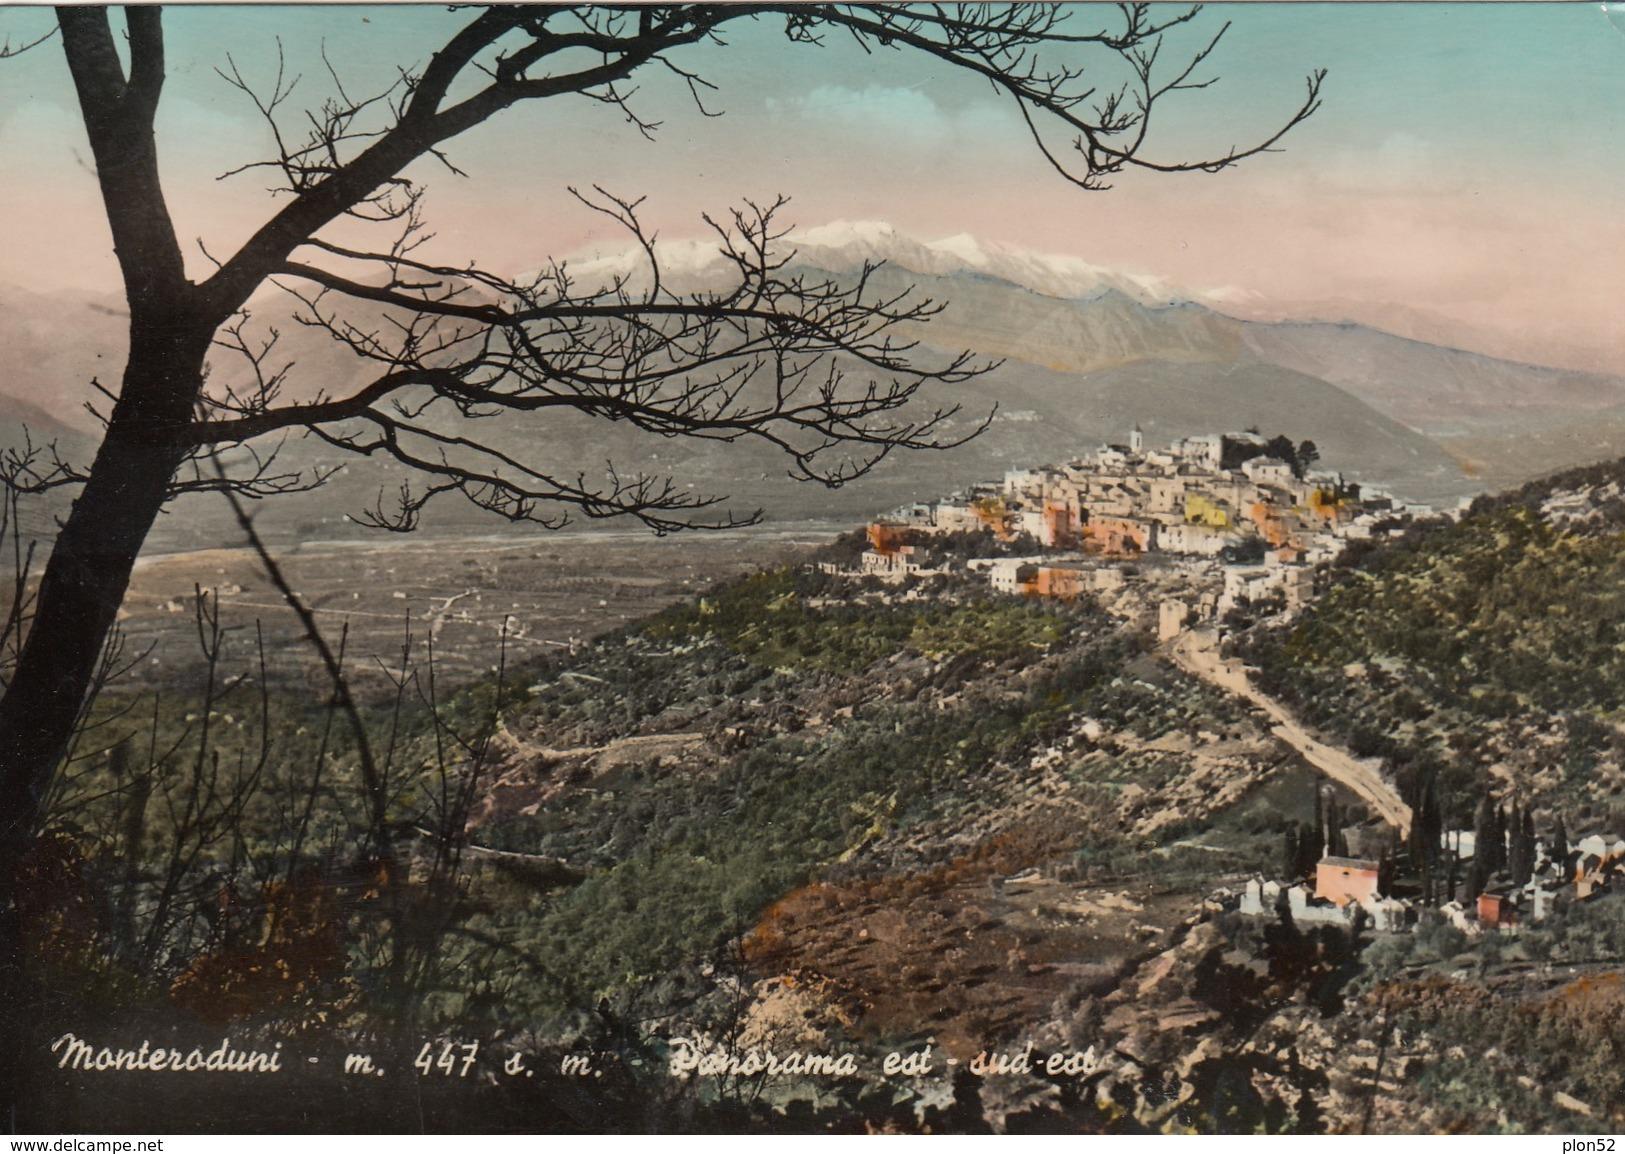 10905-MONTERODUNI(ISERNIA)-FG - Isernia